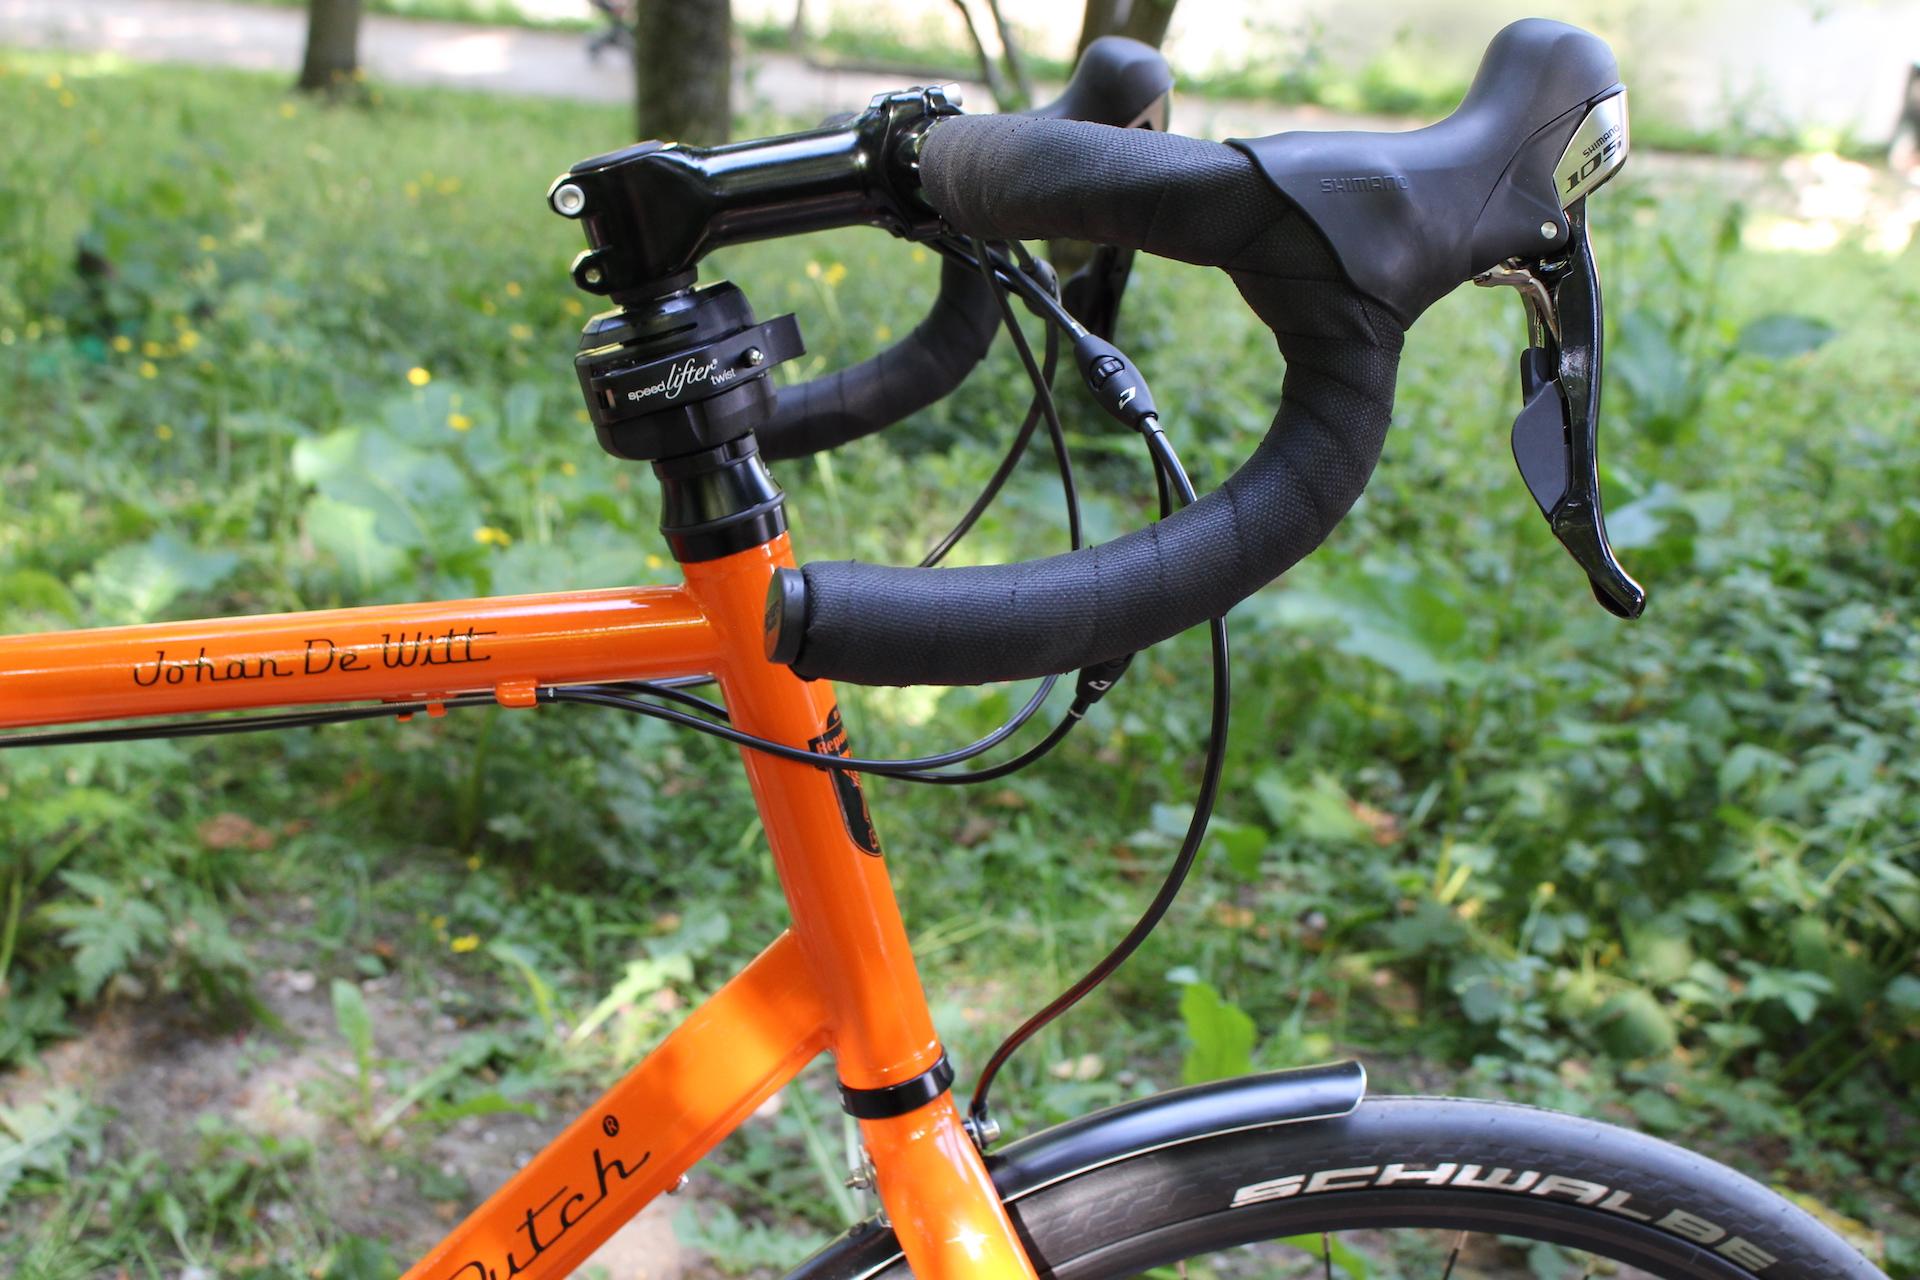 Travel bicycle - Randonneur